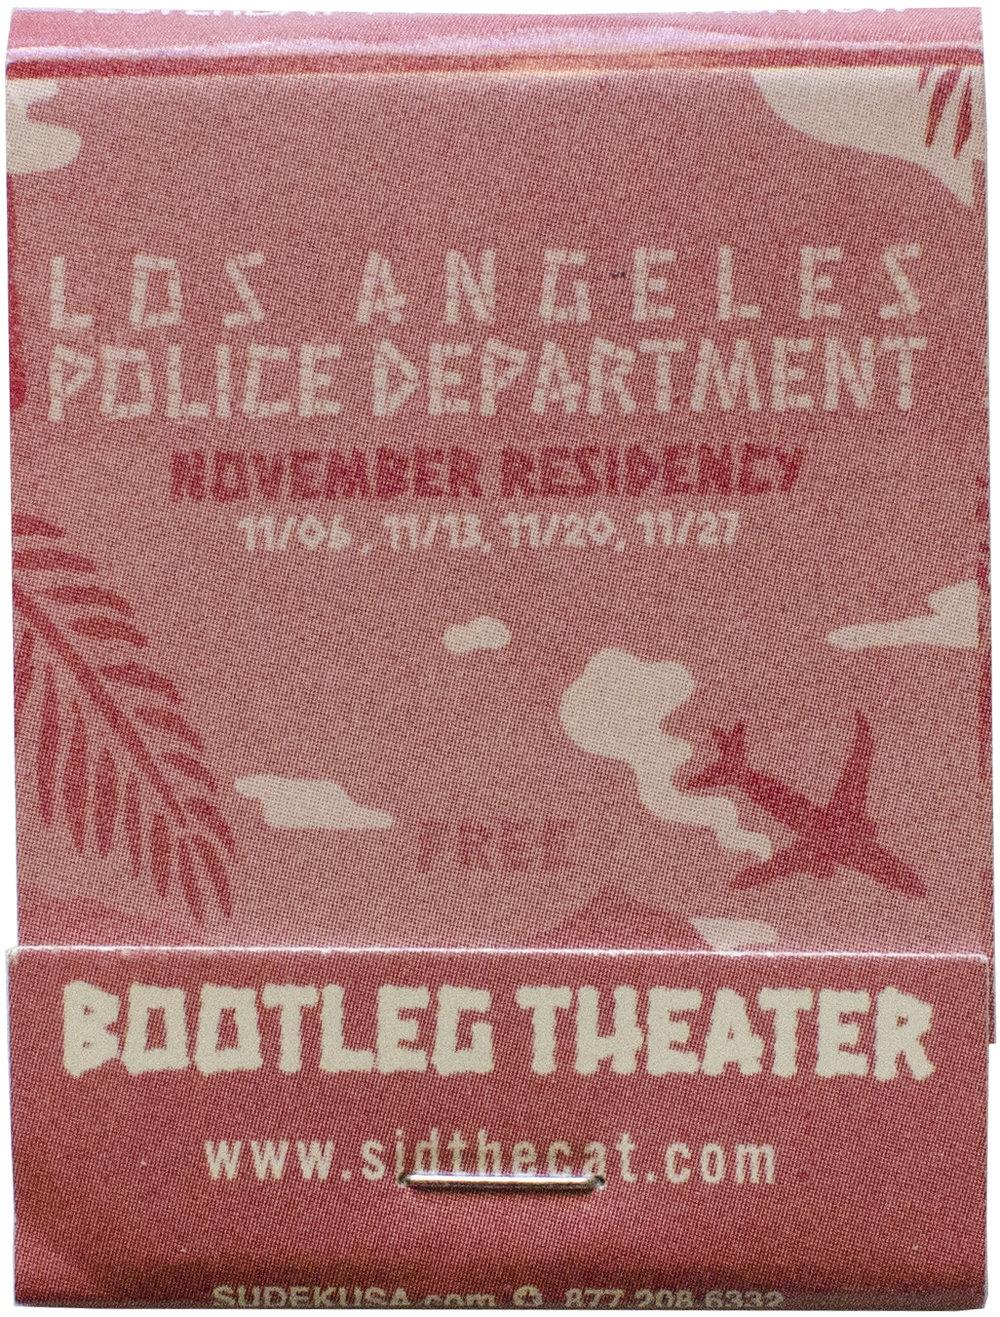 2017-11-18 LAPD.jpg